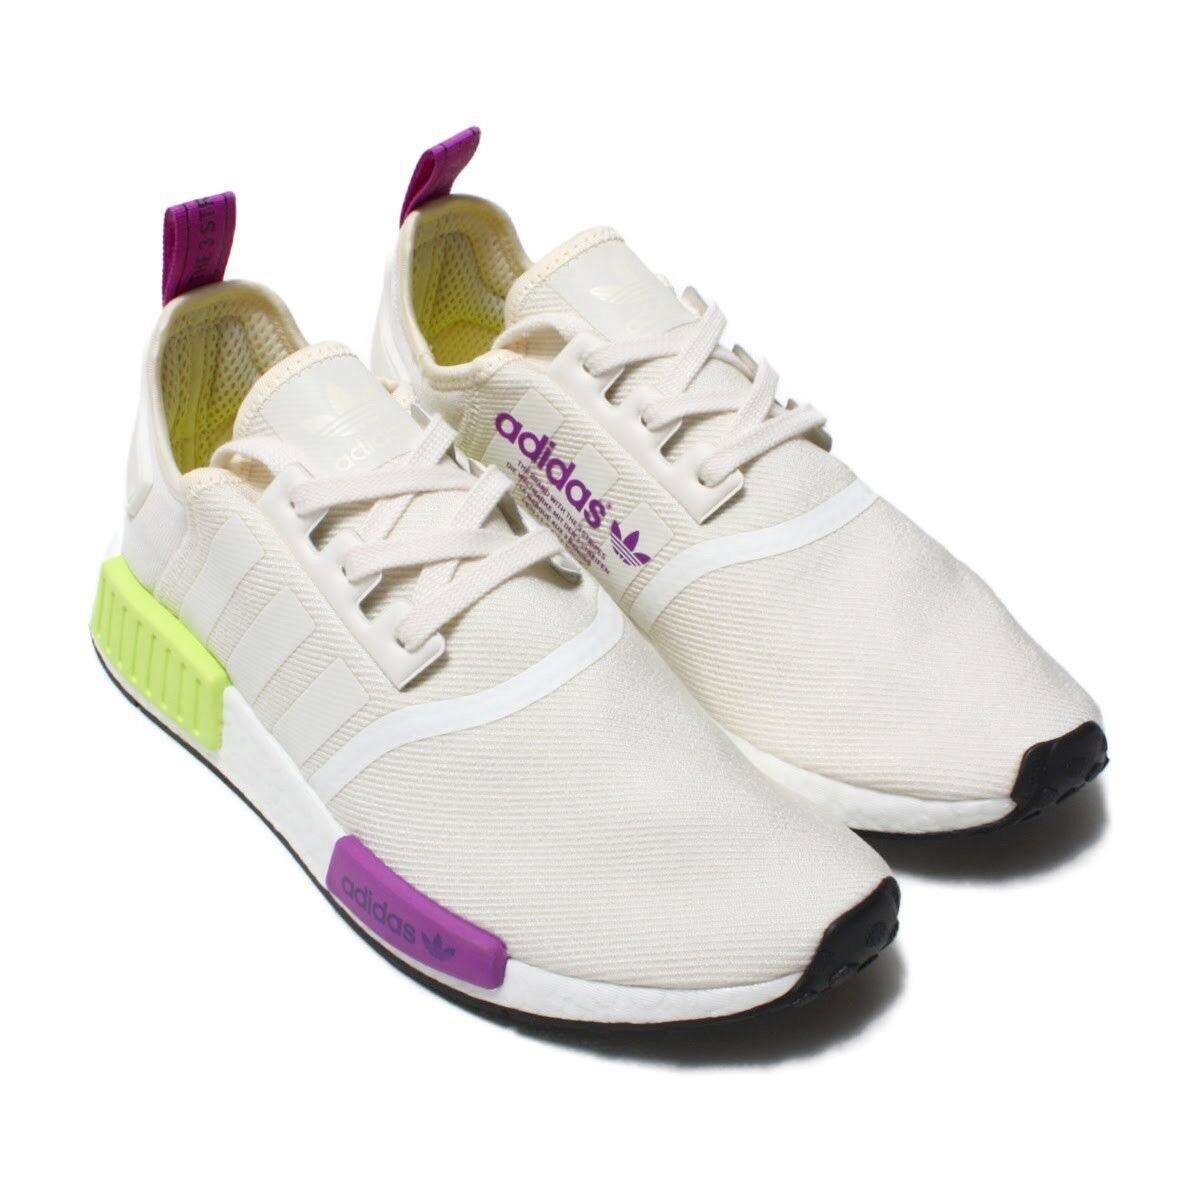 Adidas NMD R1 Chalk White & Semi Solar Yellow D96626 Men's Boost Knit Black